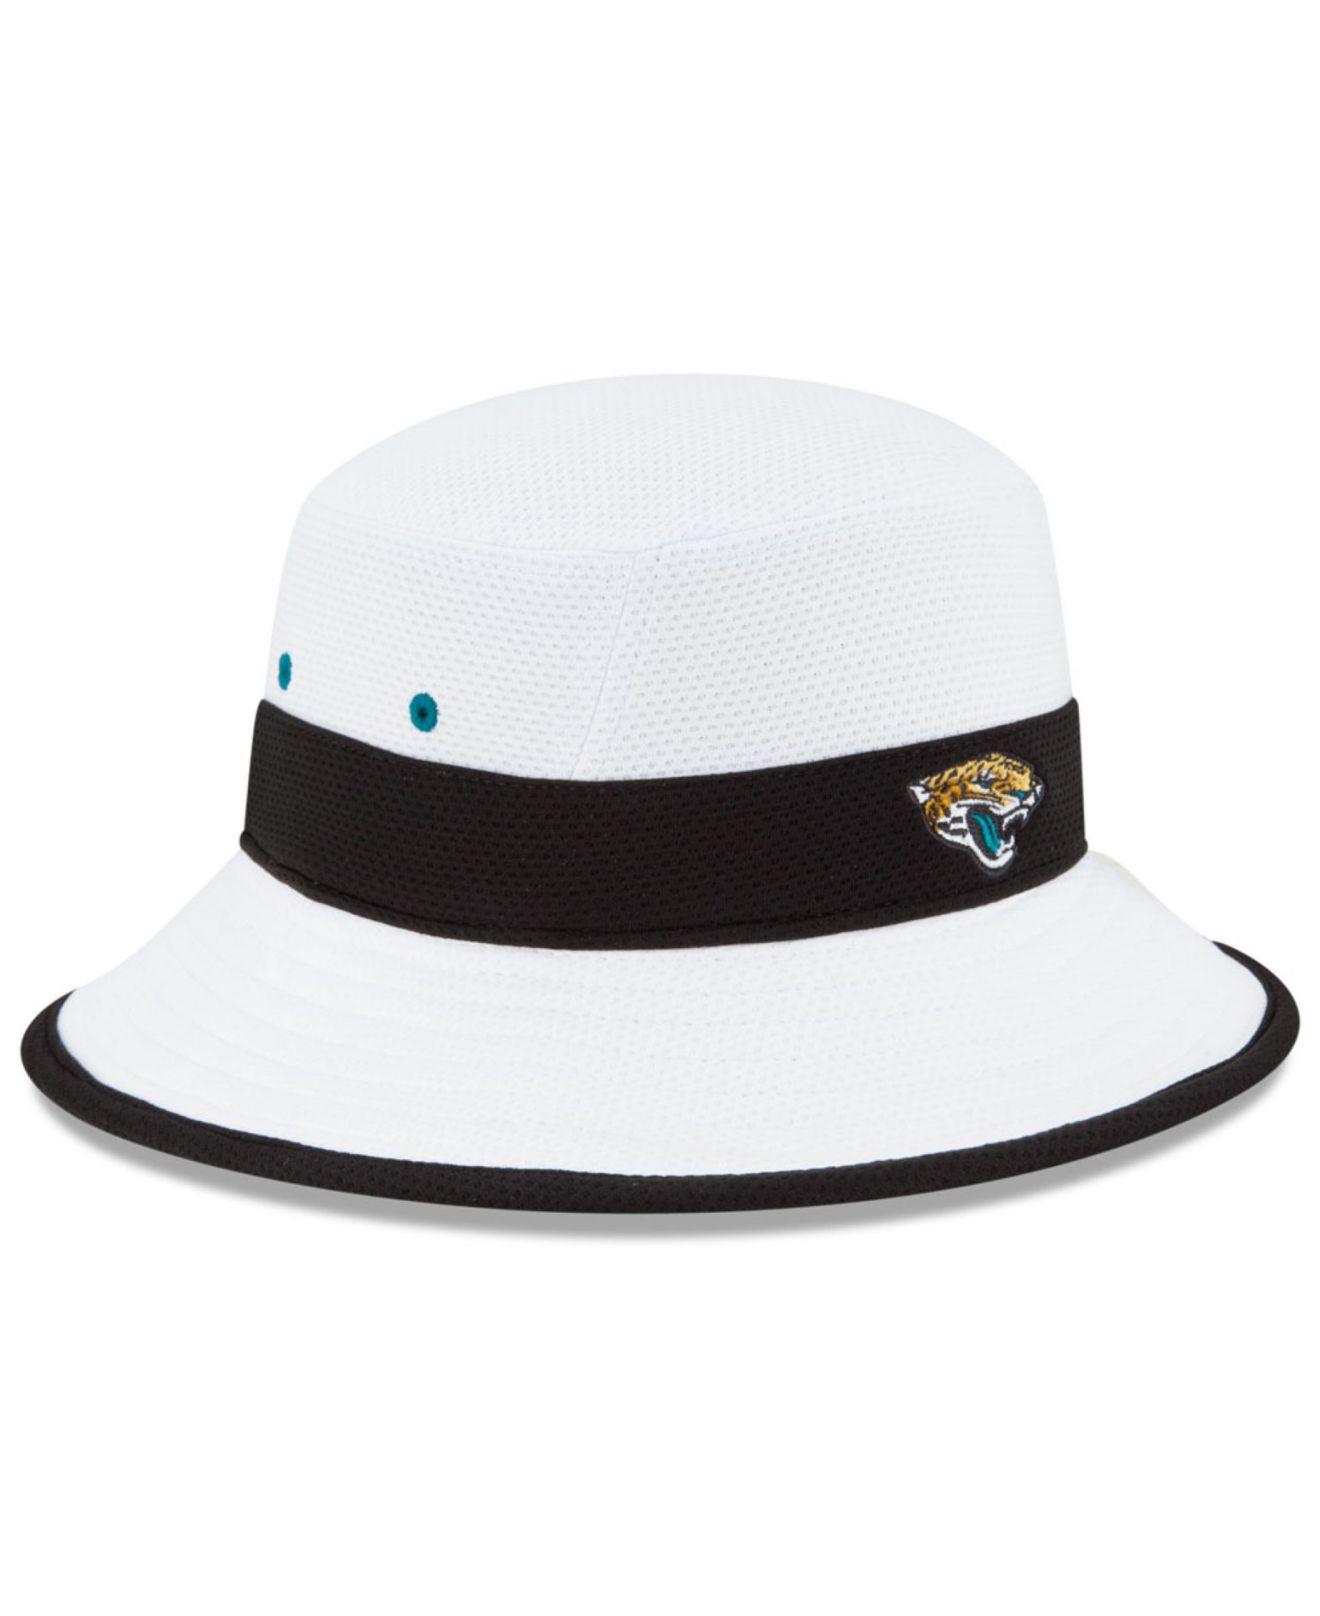 new style sale 50% price cheap vikings fishing hat